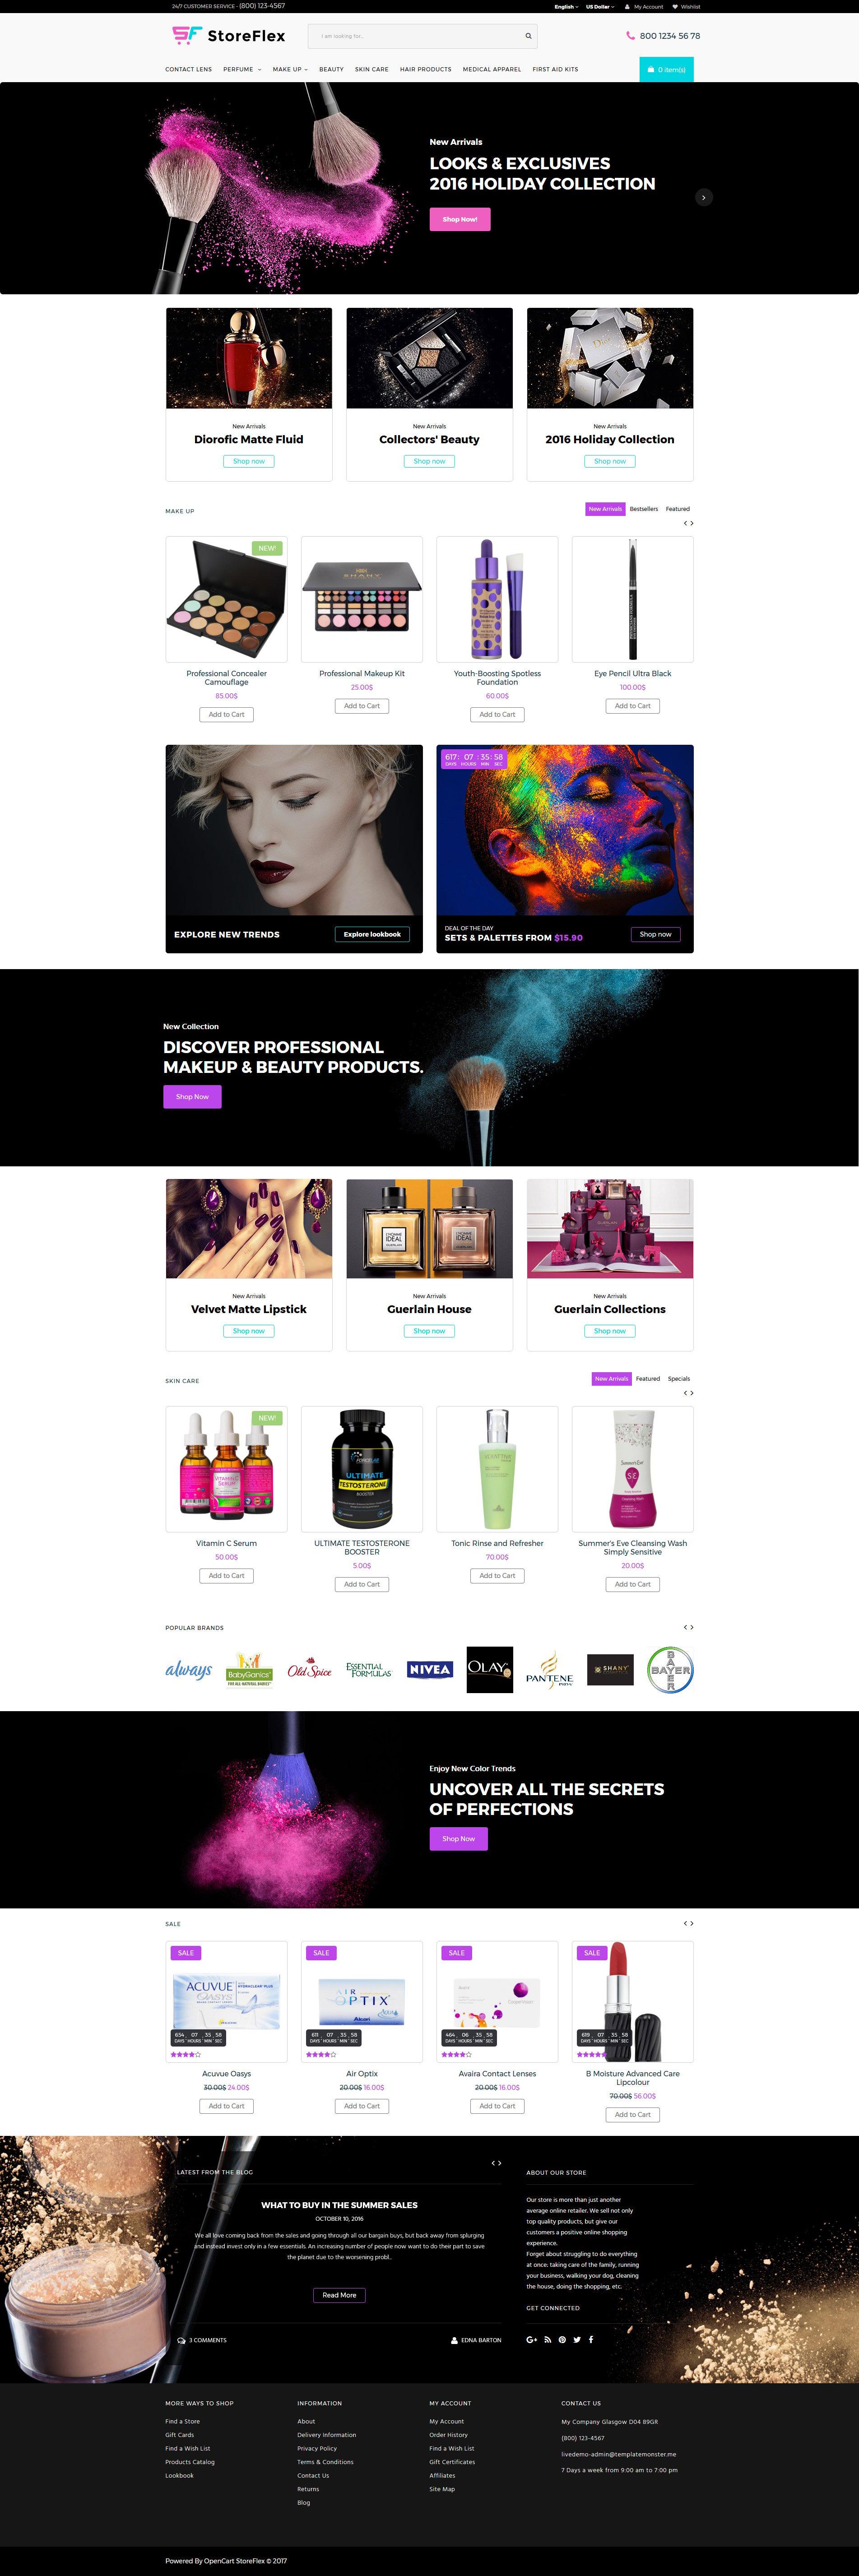 """StoreFlex - Cosmetics Store Responsive"" 响应式OpenCart模板 #63354"